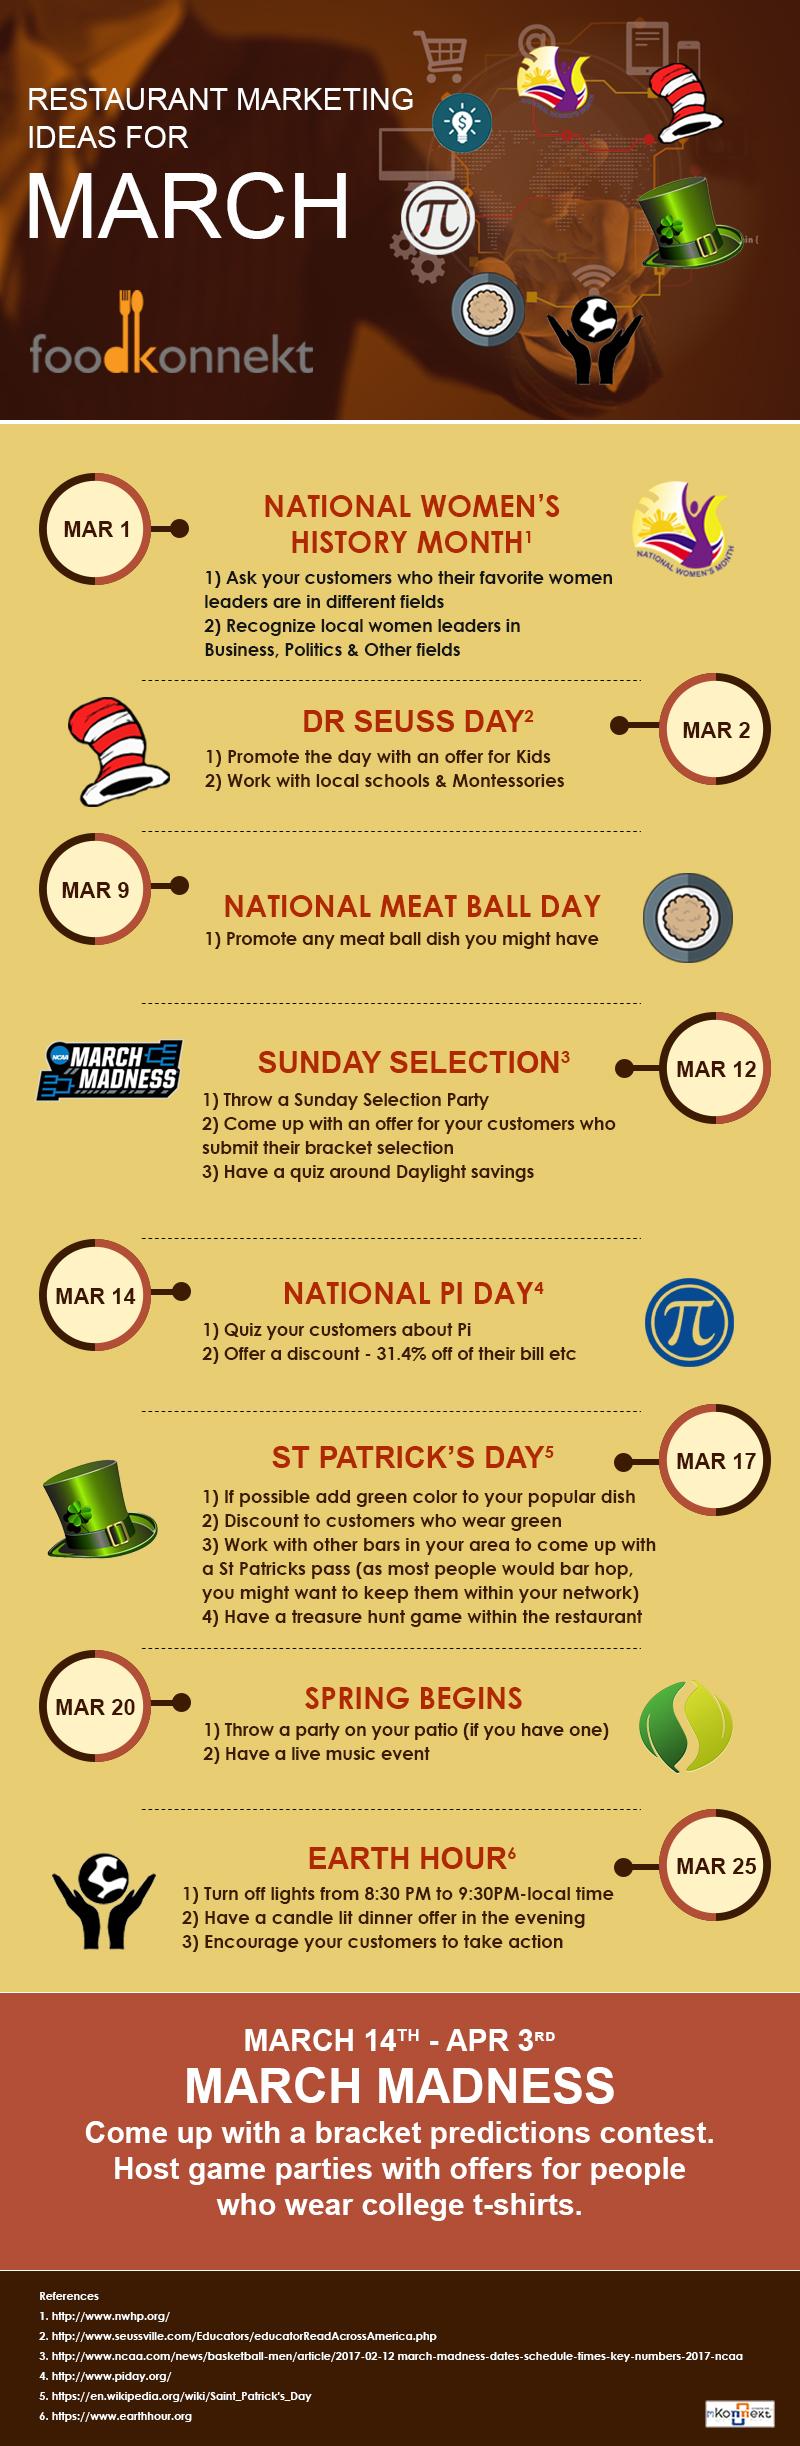 Restaurant marketing ideas for March 2017